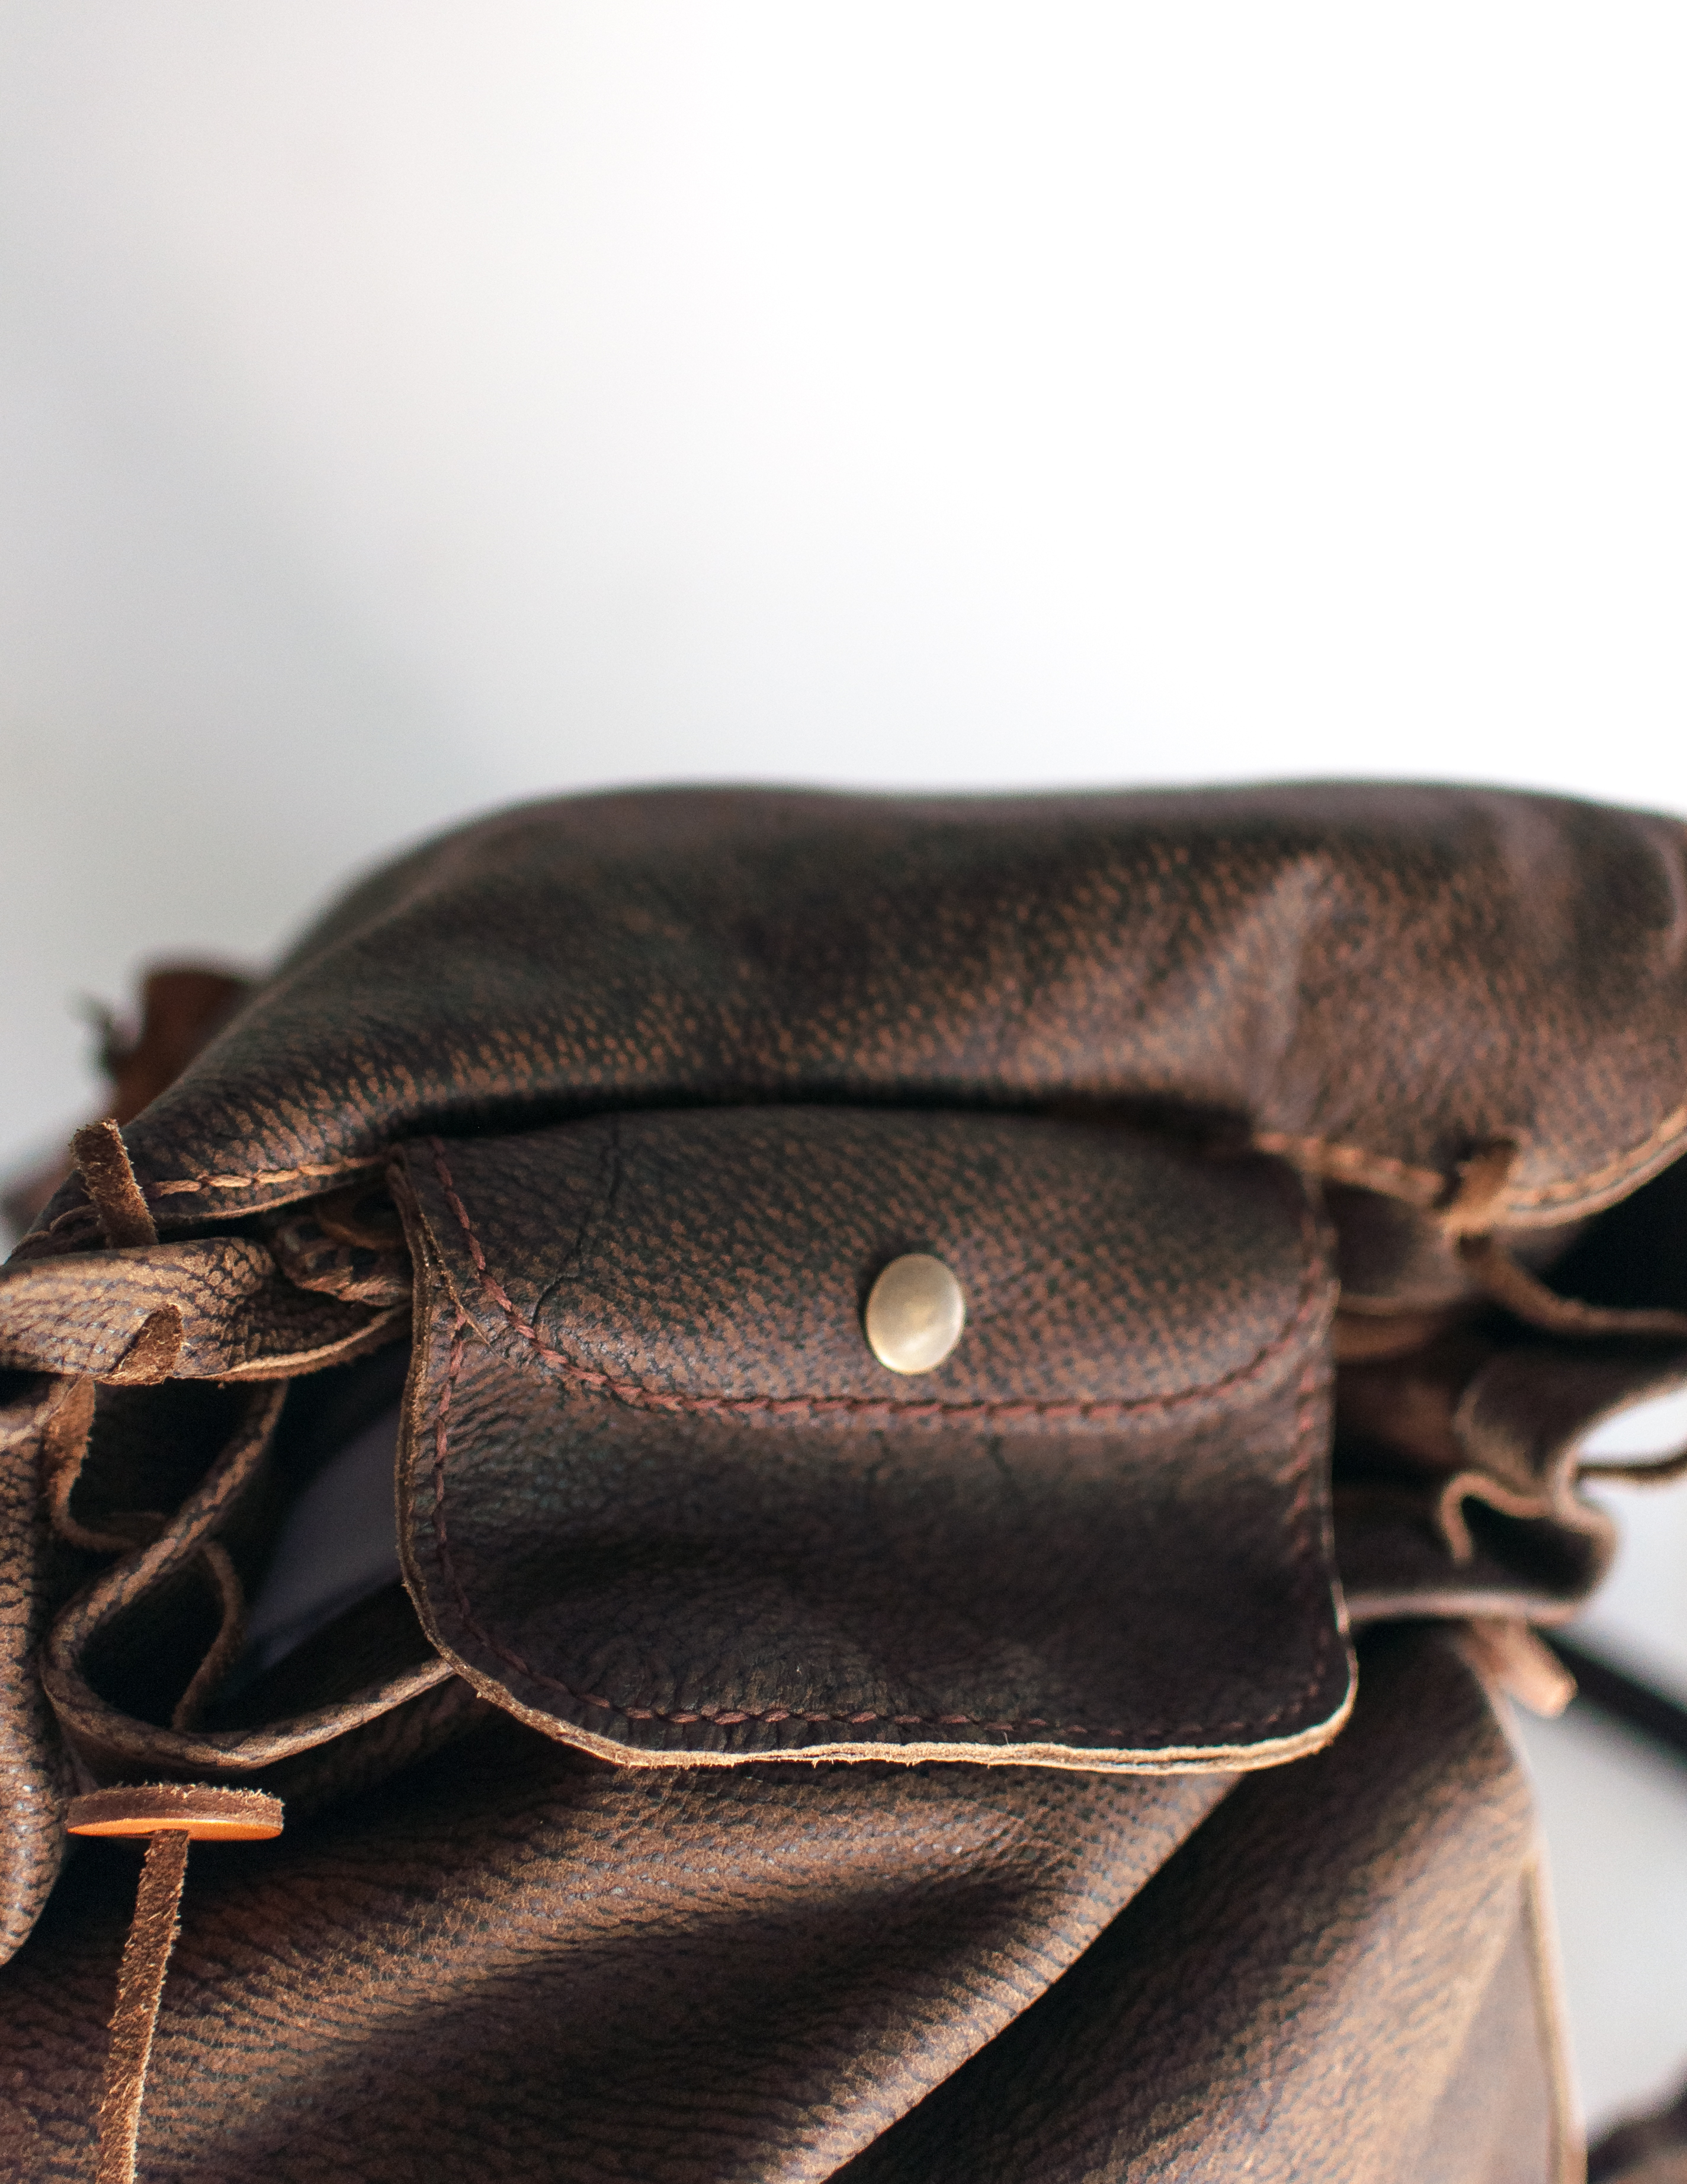 steampunk-backpack-gemsbok-leather-handmade-afrikaburn